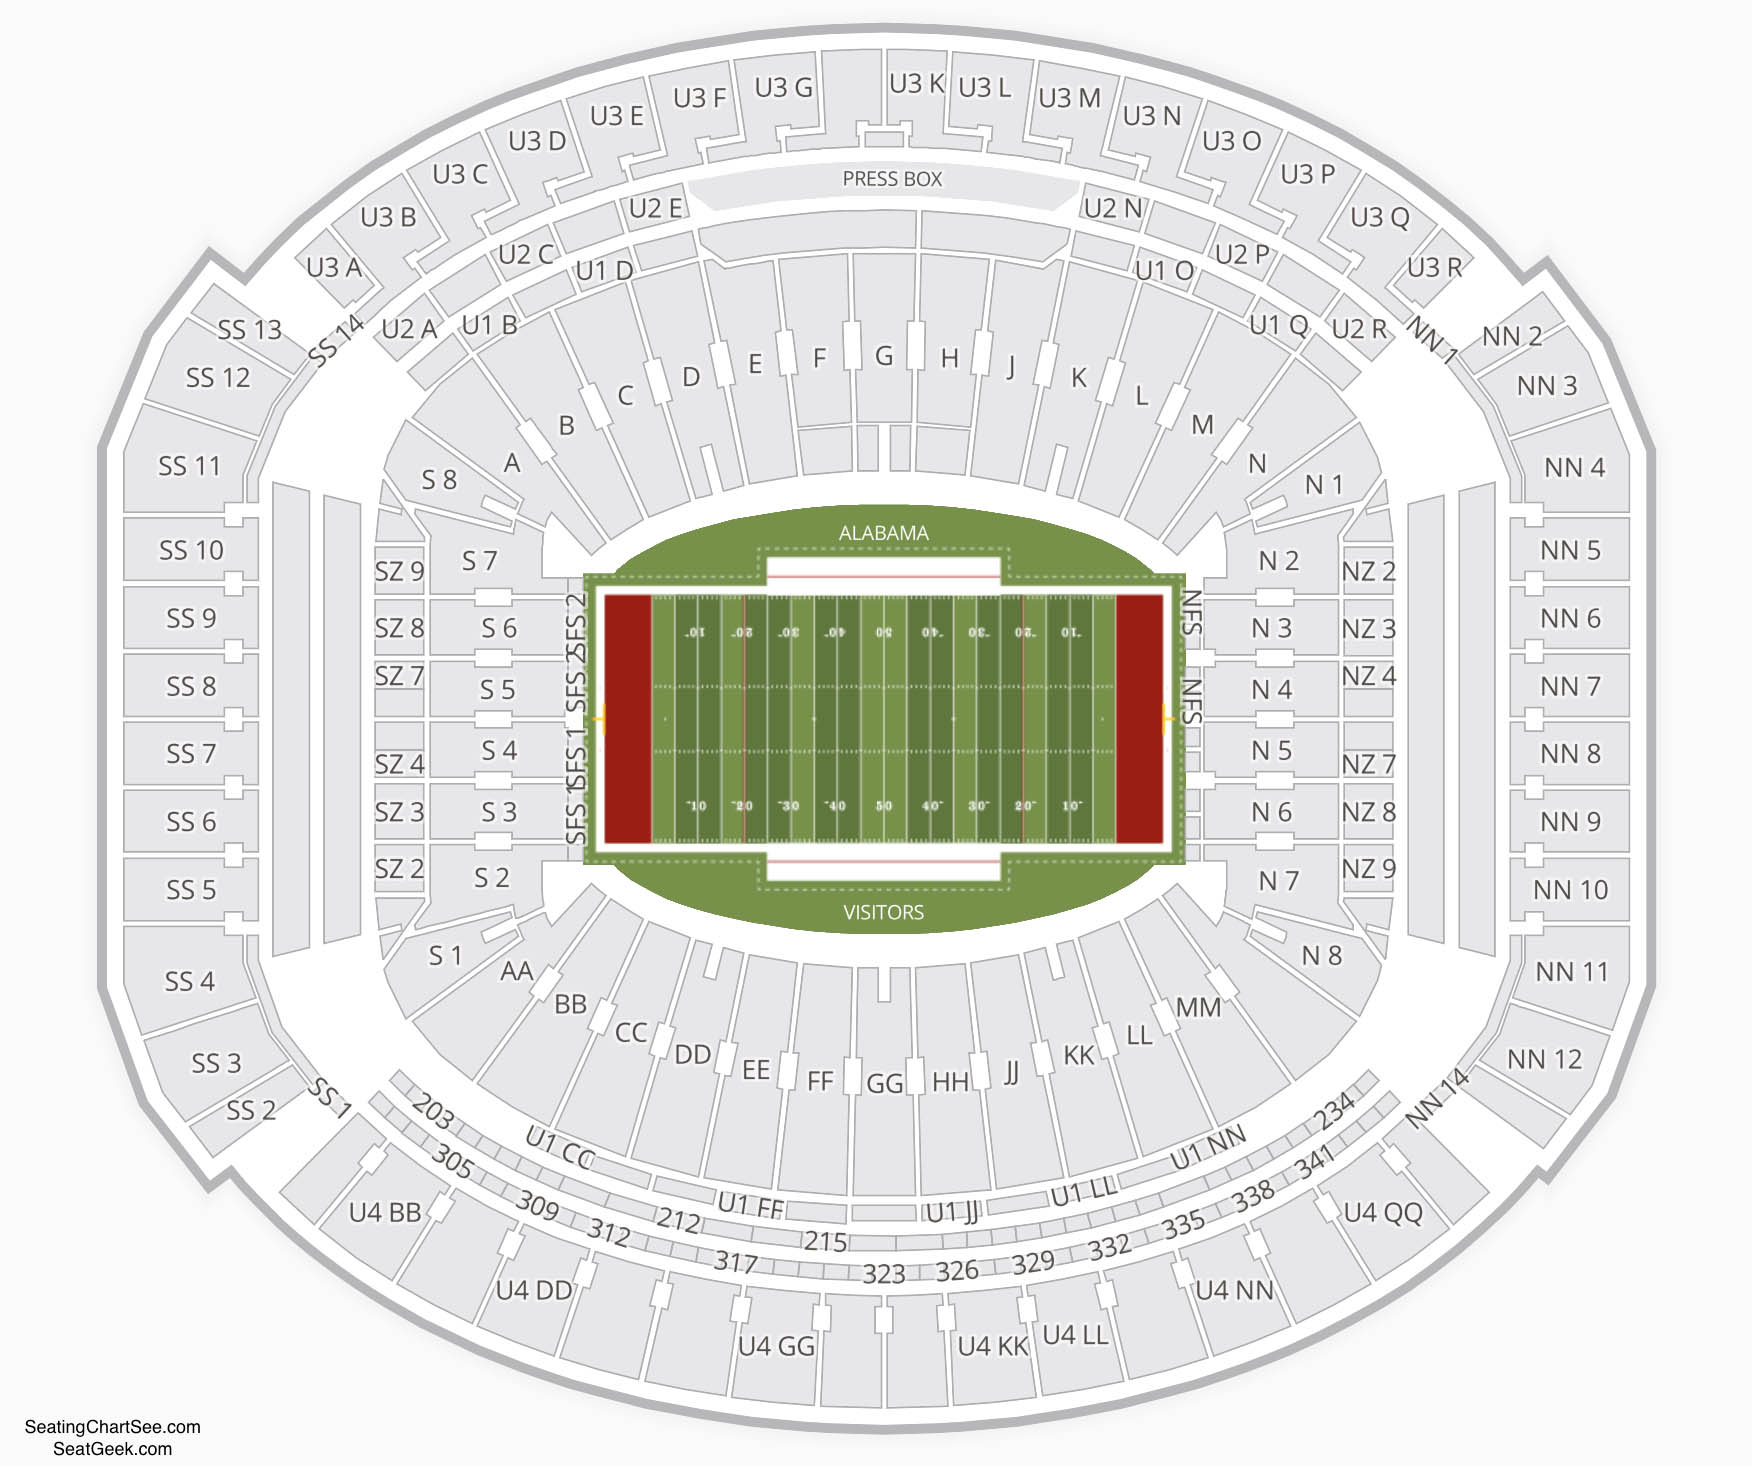 Bryant Denny Stadium Seating Charts